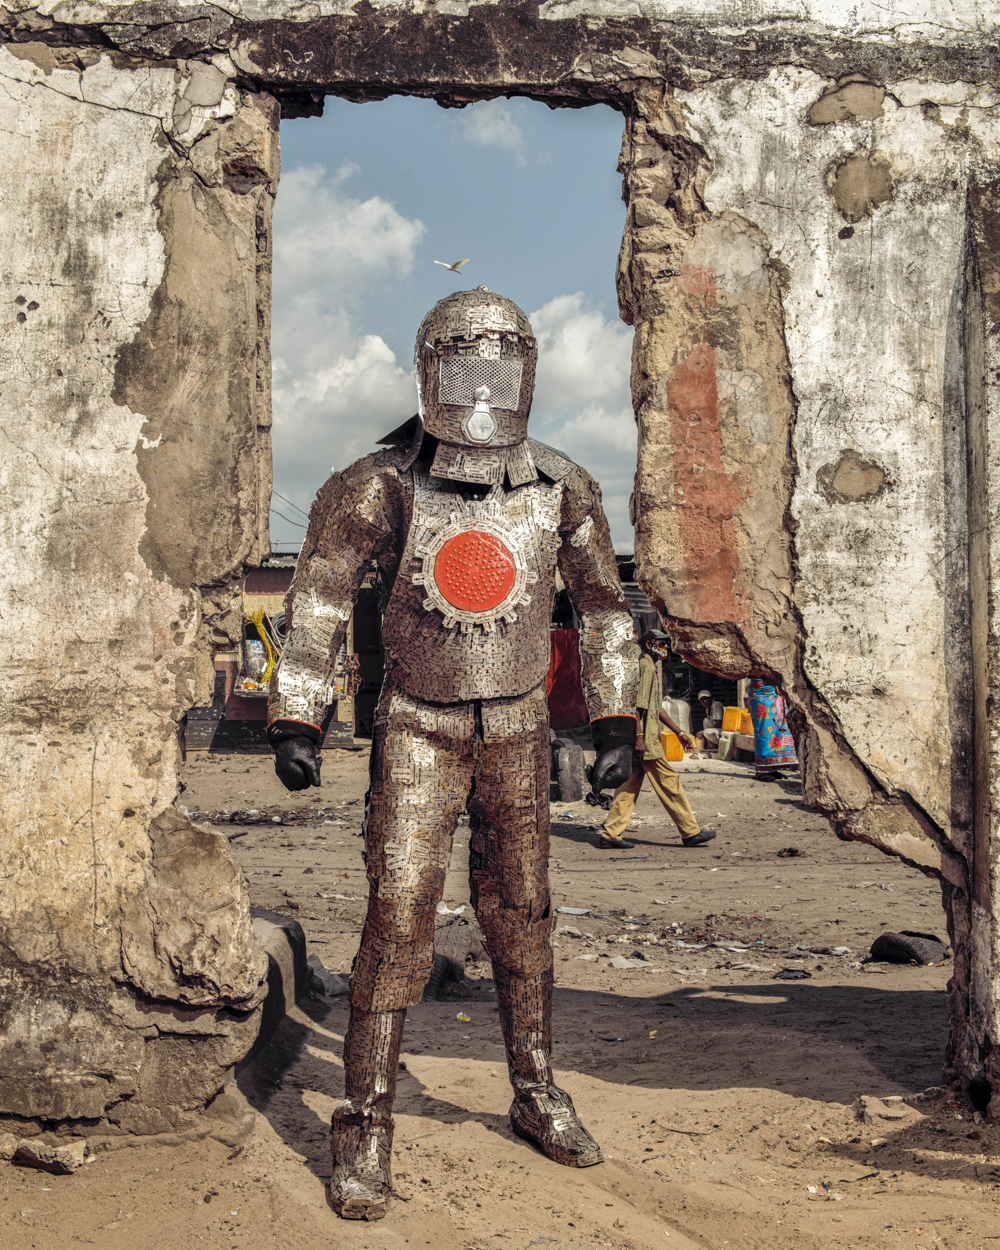 Untitled #13, 2020 Homo Detritus, Real Portraitik #5 Kinshasa, RDC ©Stephan Gladieu